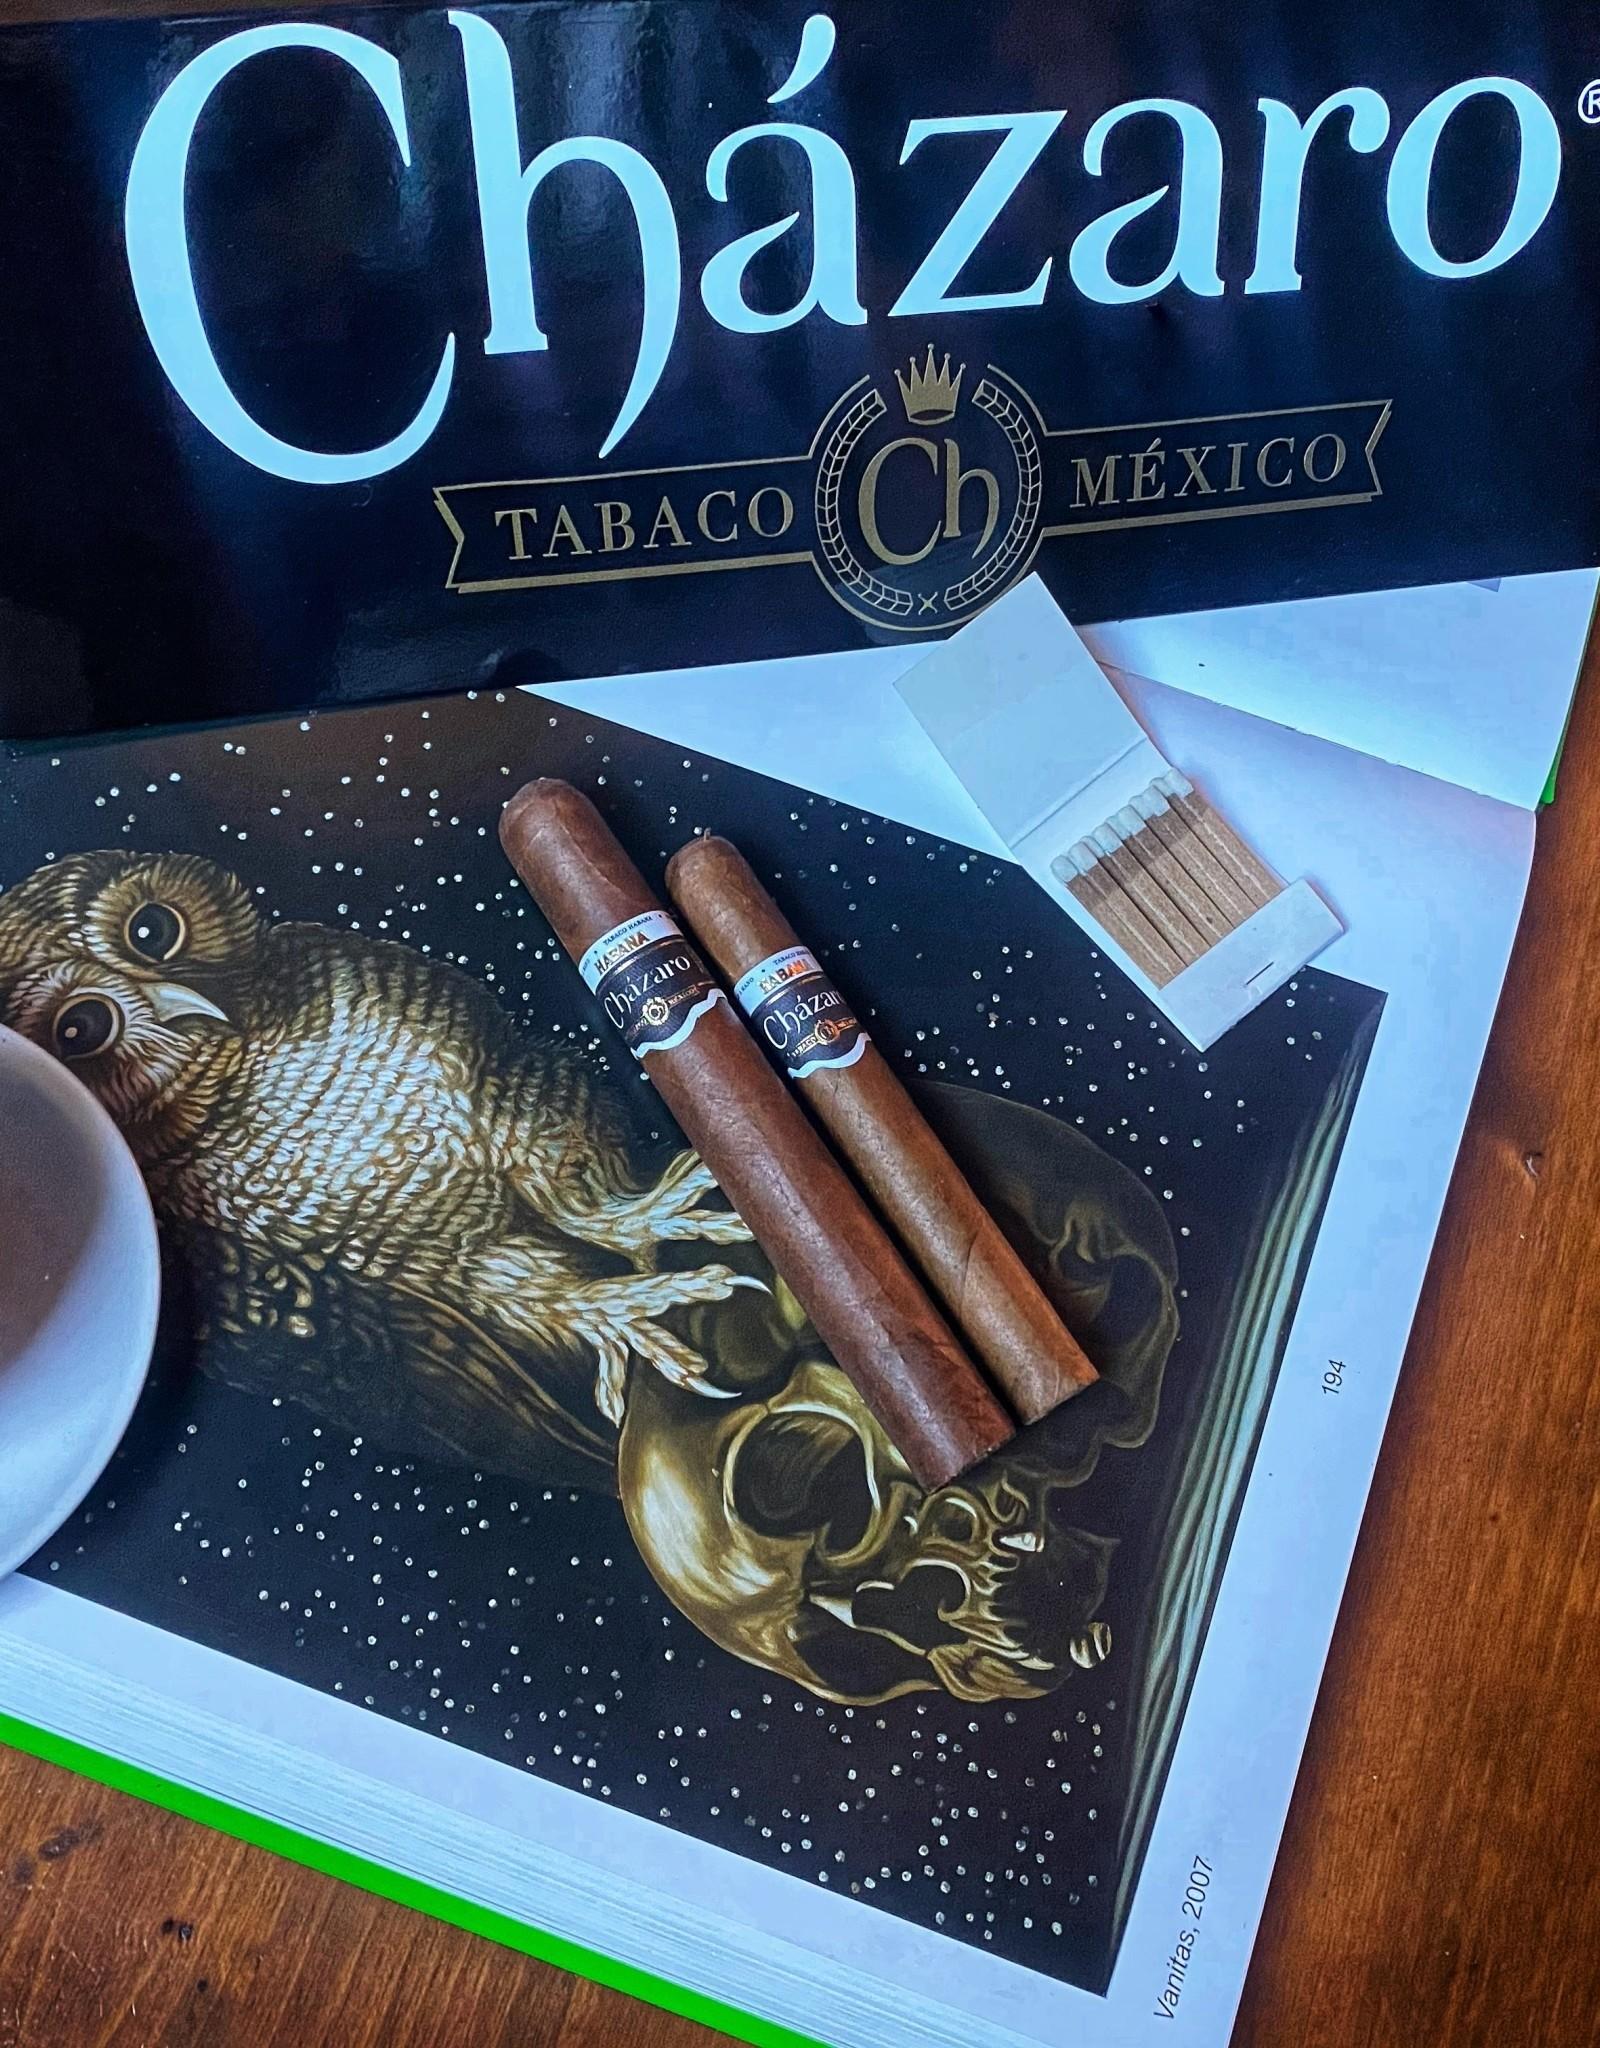 Black Chazaro Black Chazaro Habano Toro 6 x 50